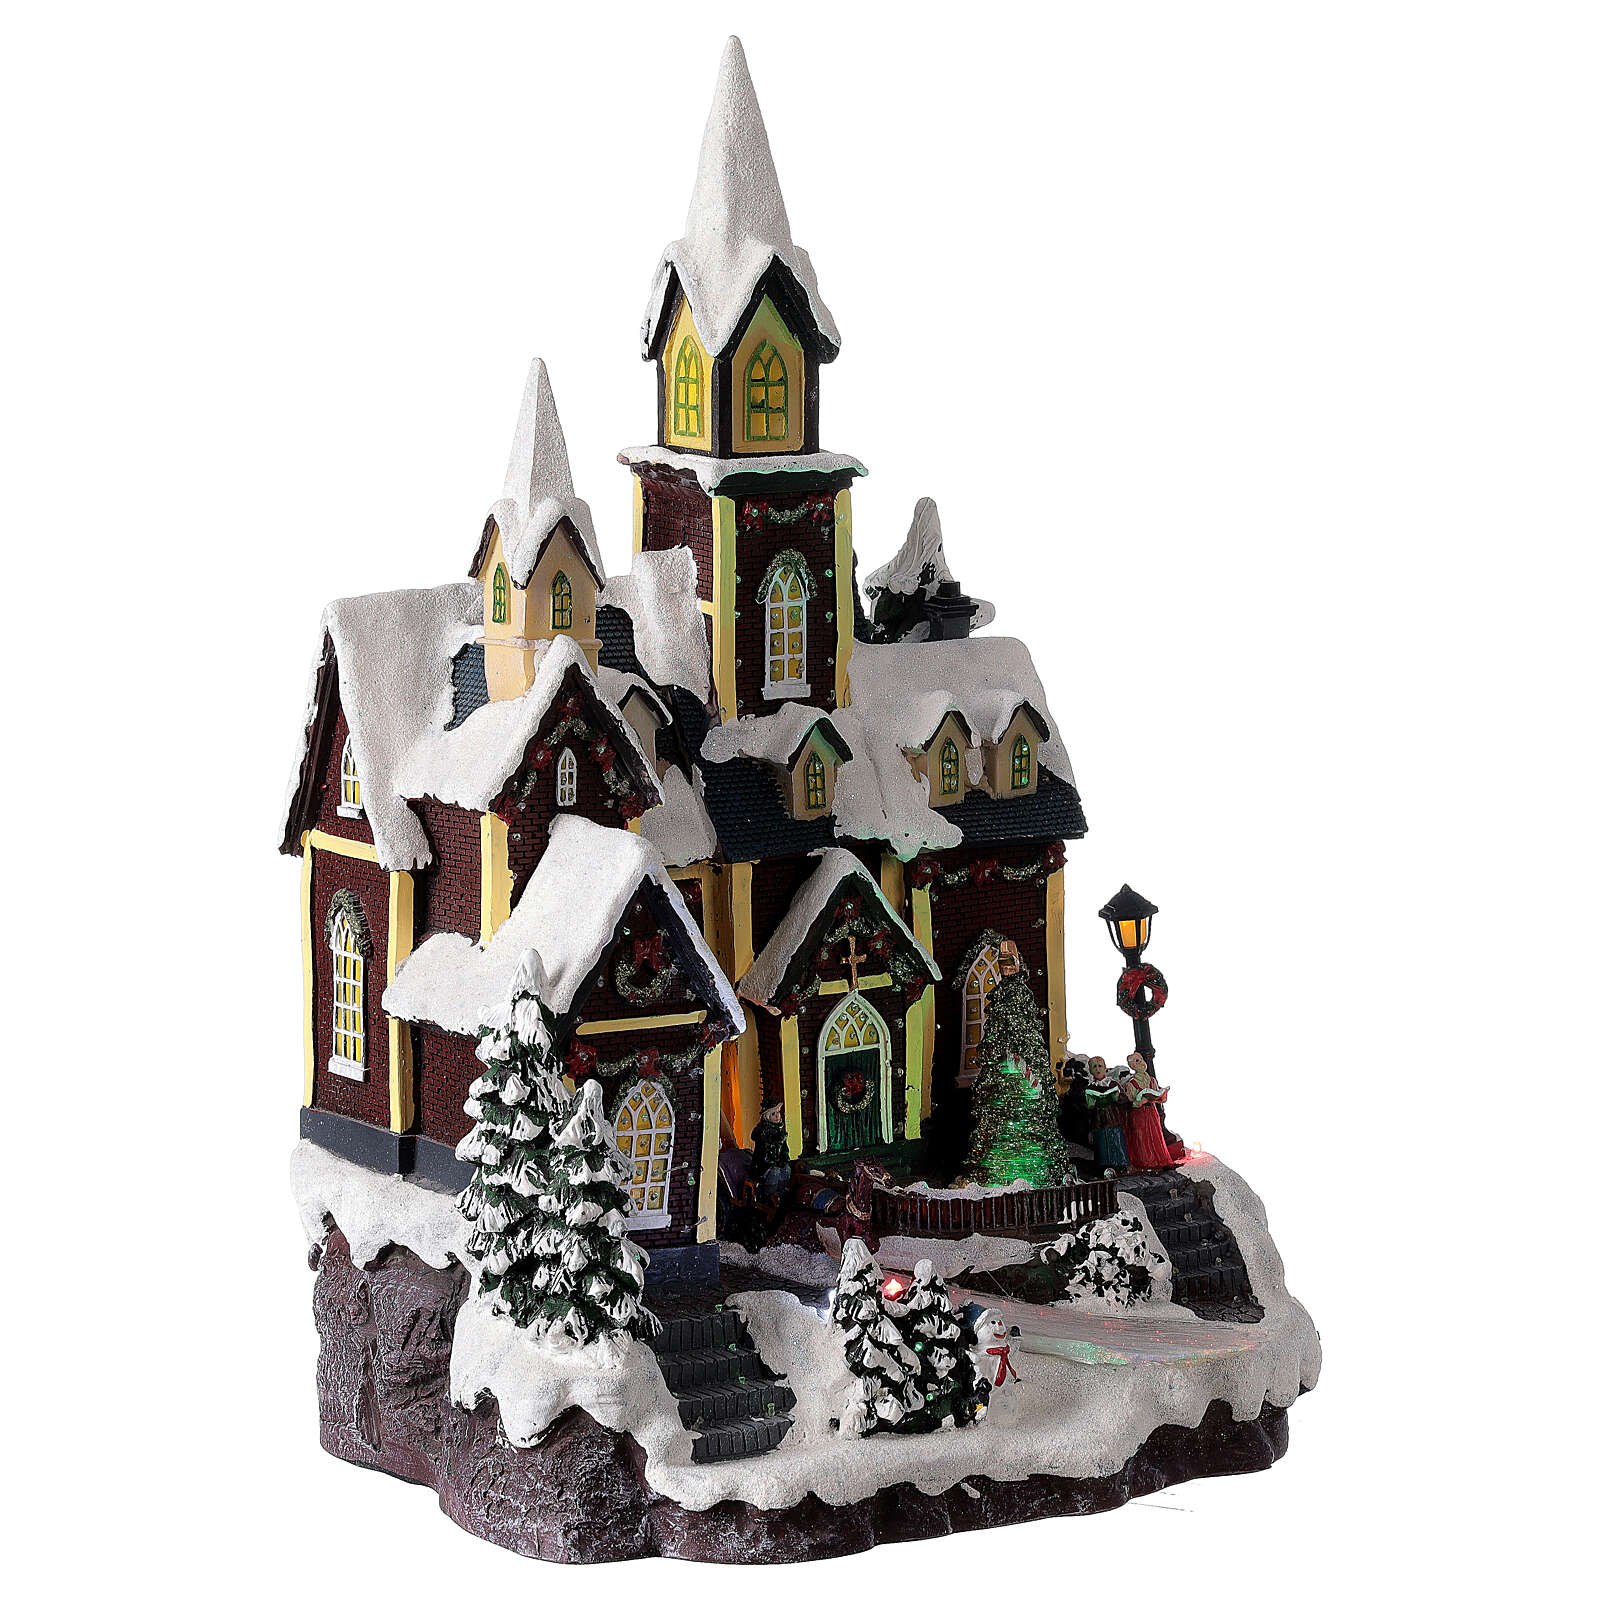 Nordic church Christmas village snowy lights music 45x30x25 cm 3